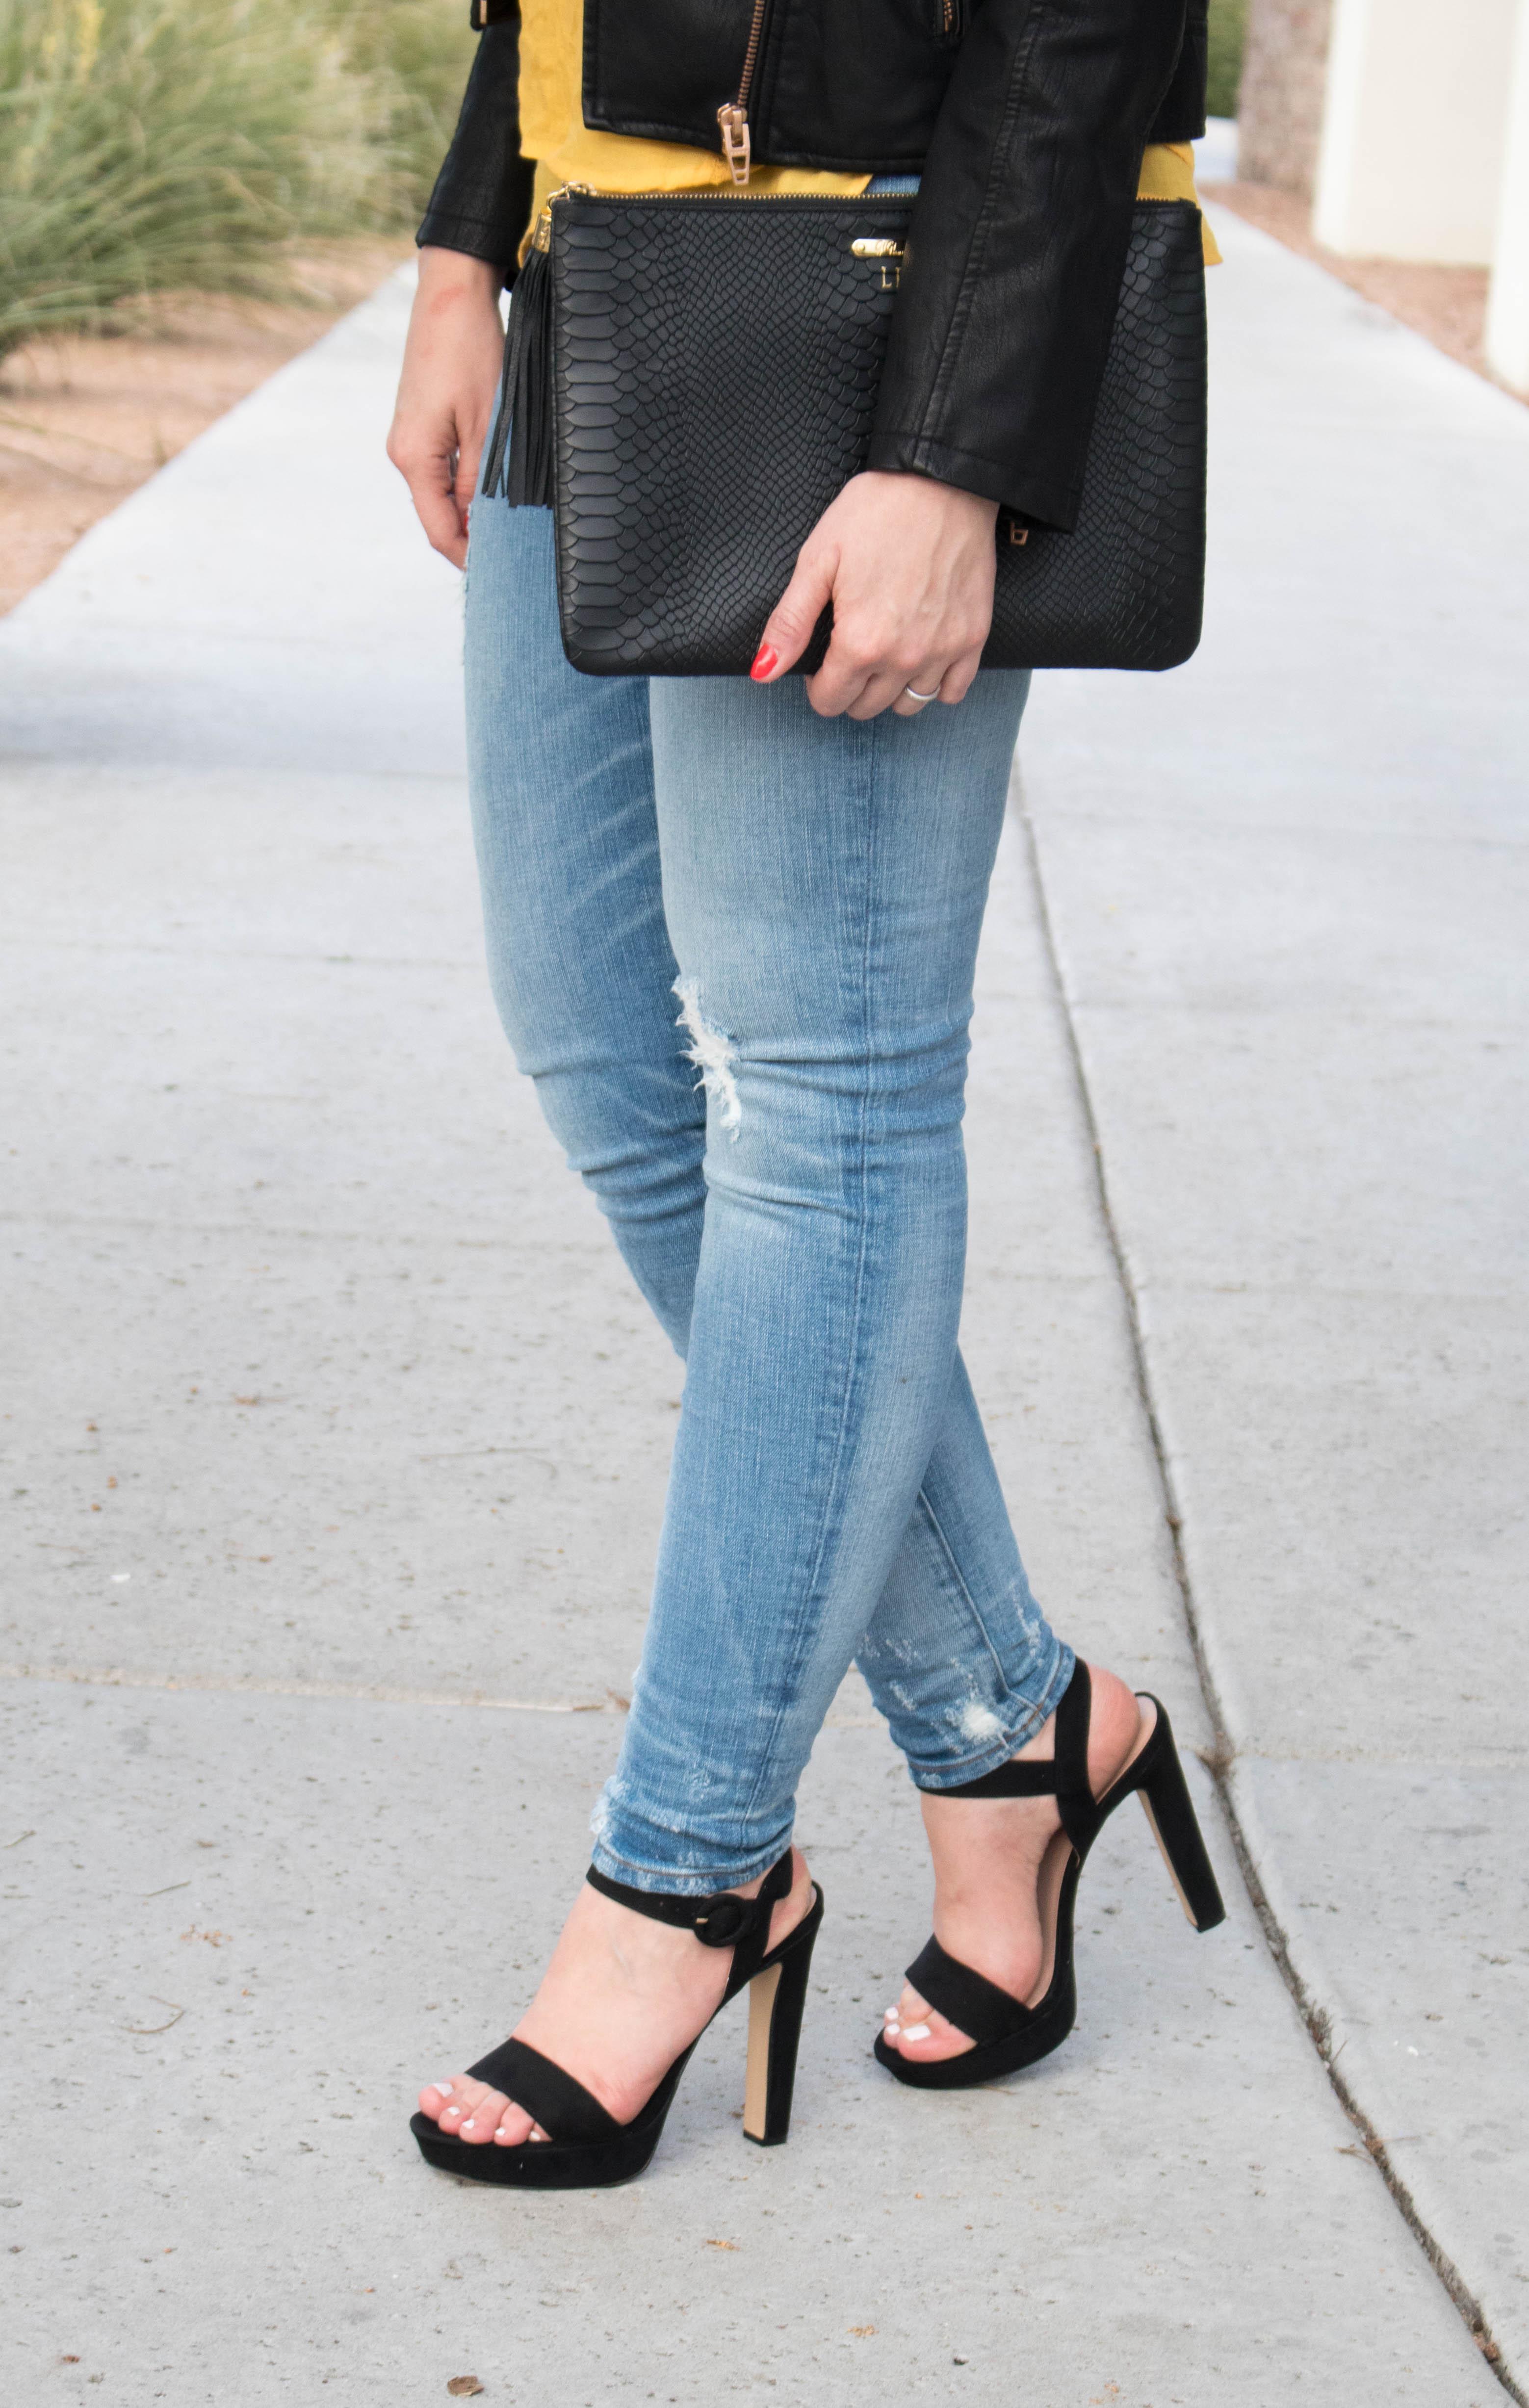 madden nyc platform heels #kohls #maddennyc #platformheels